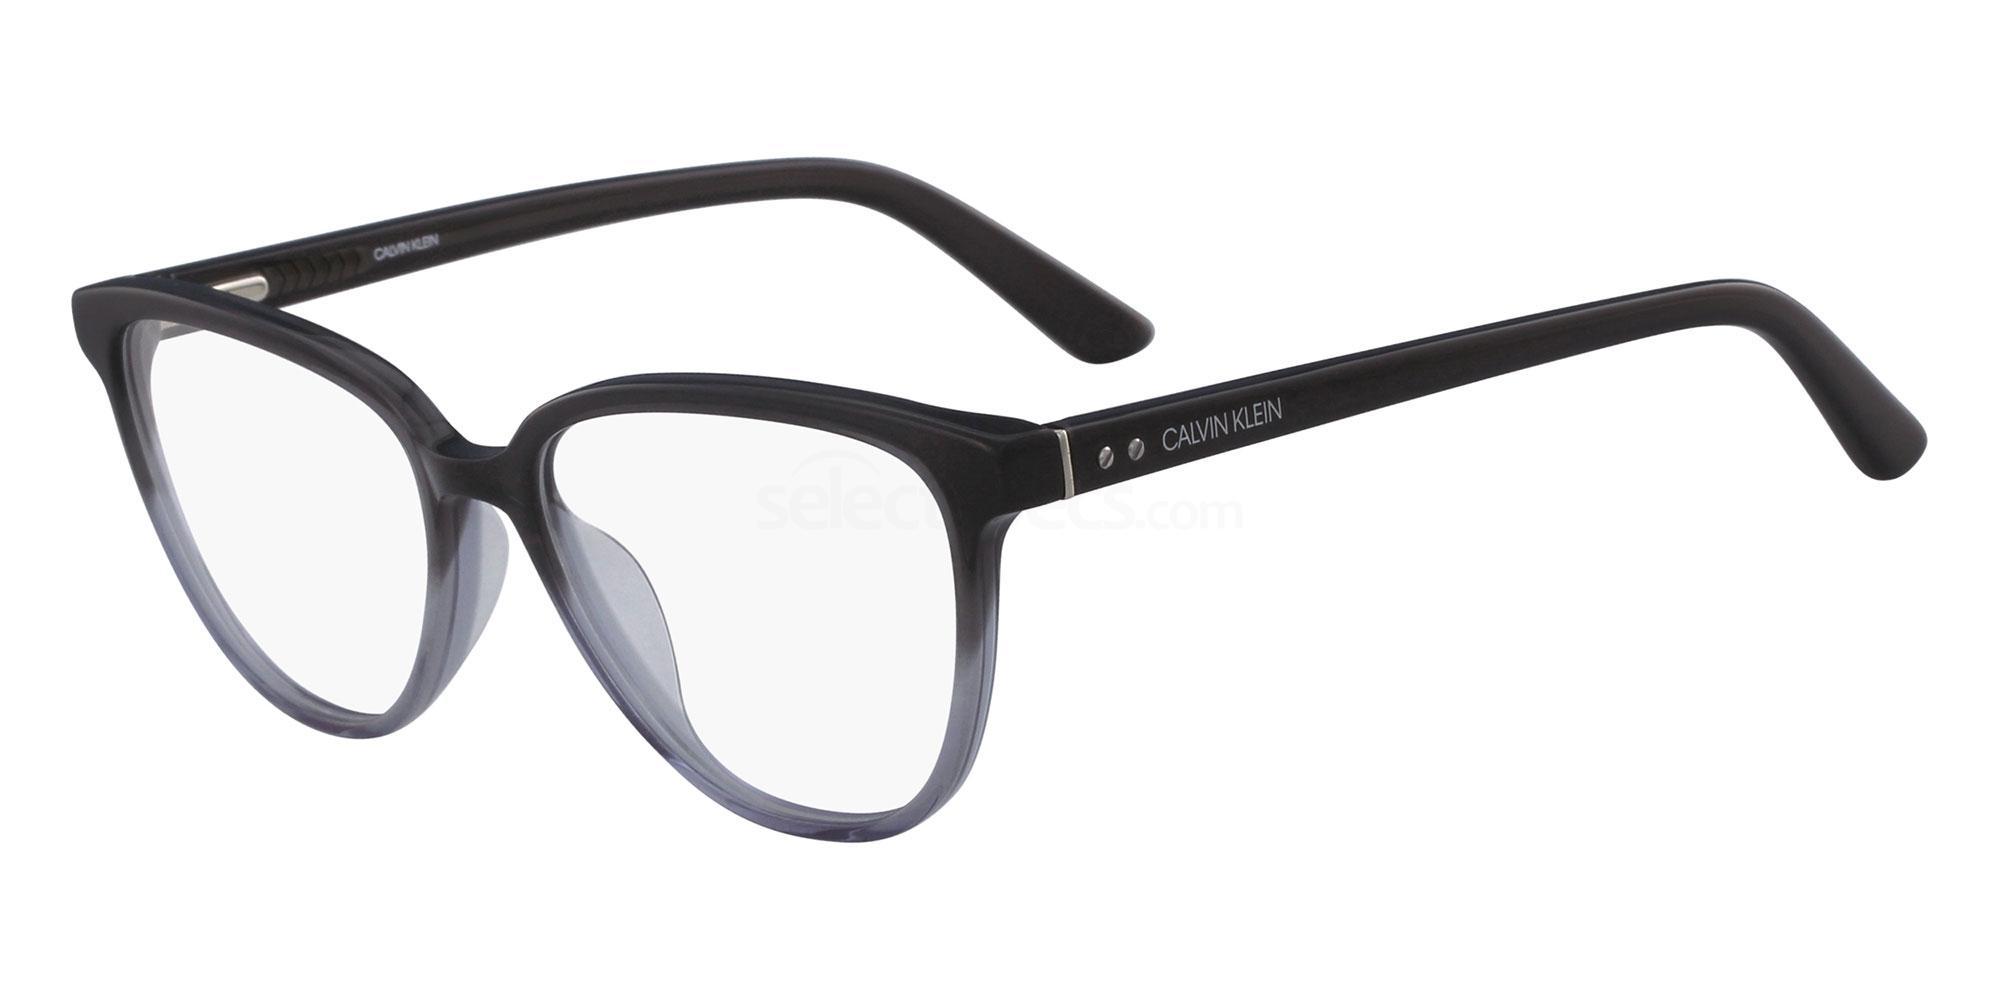 019 CK18514 Glasses, Calvin Klein